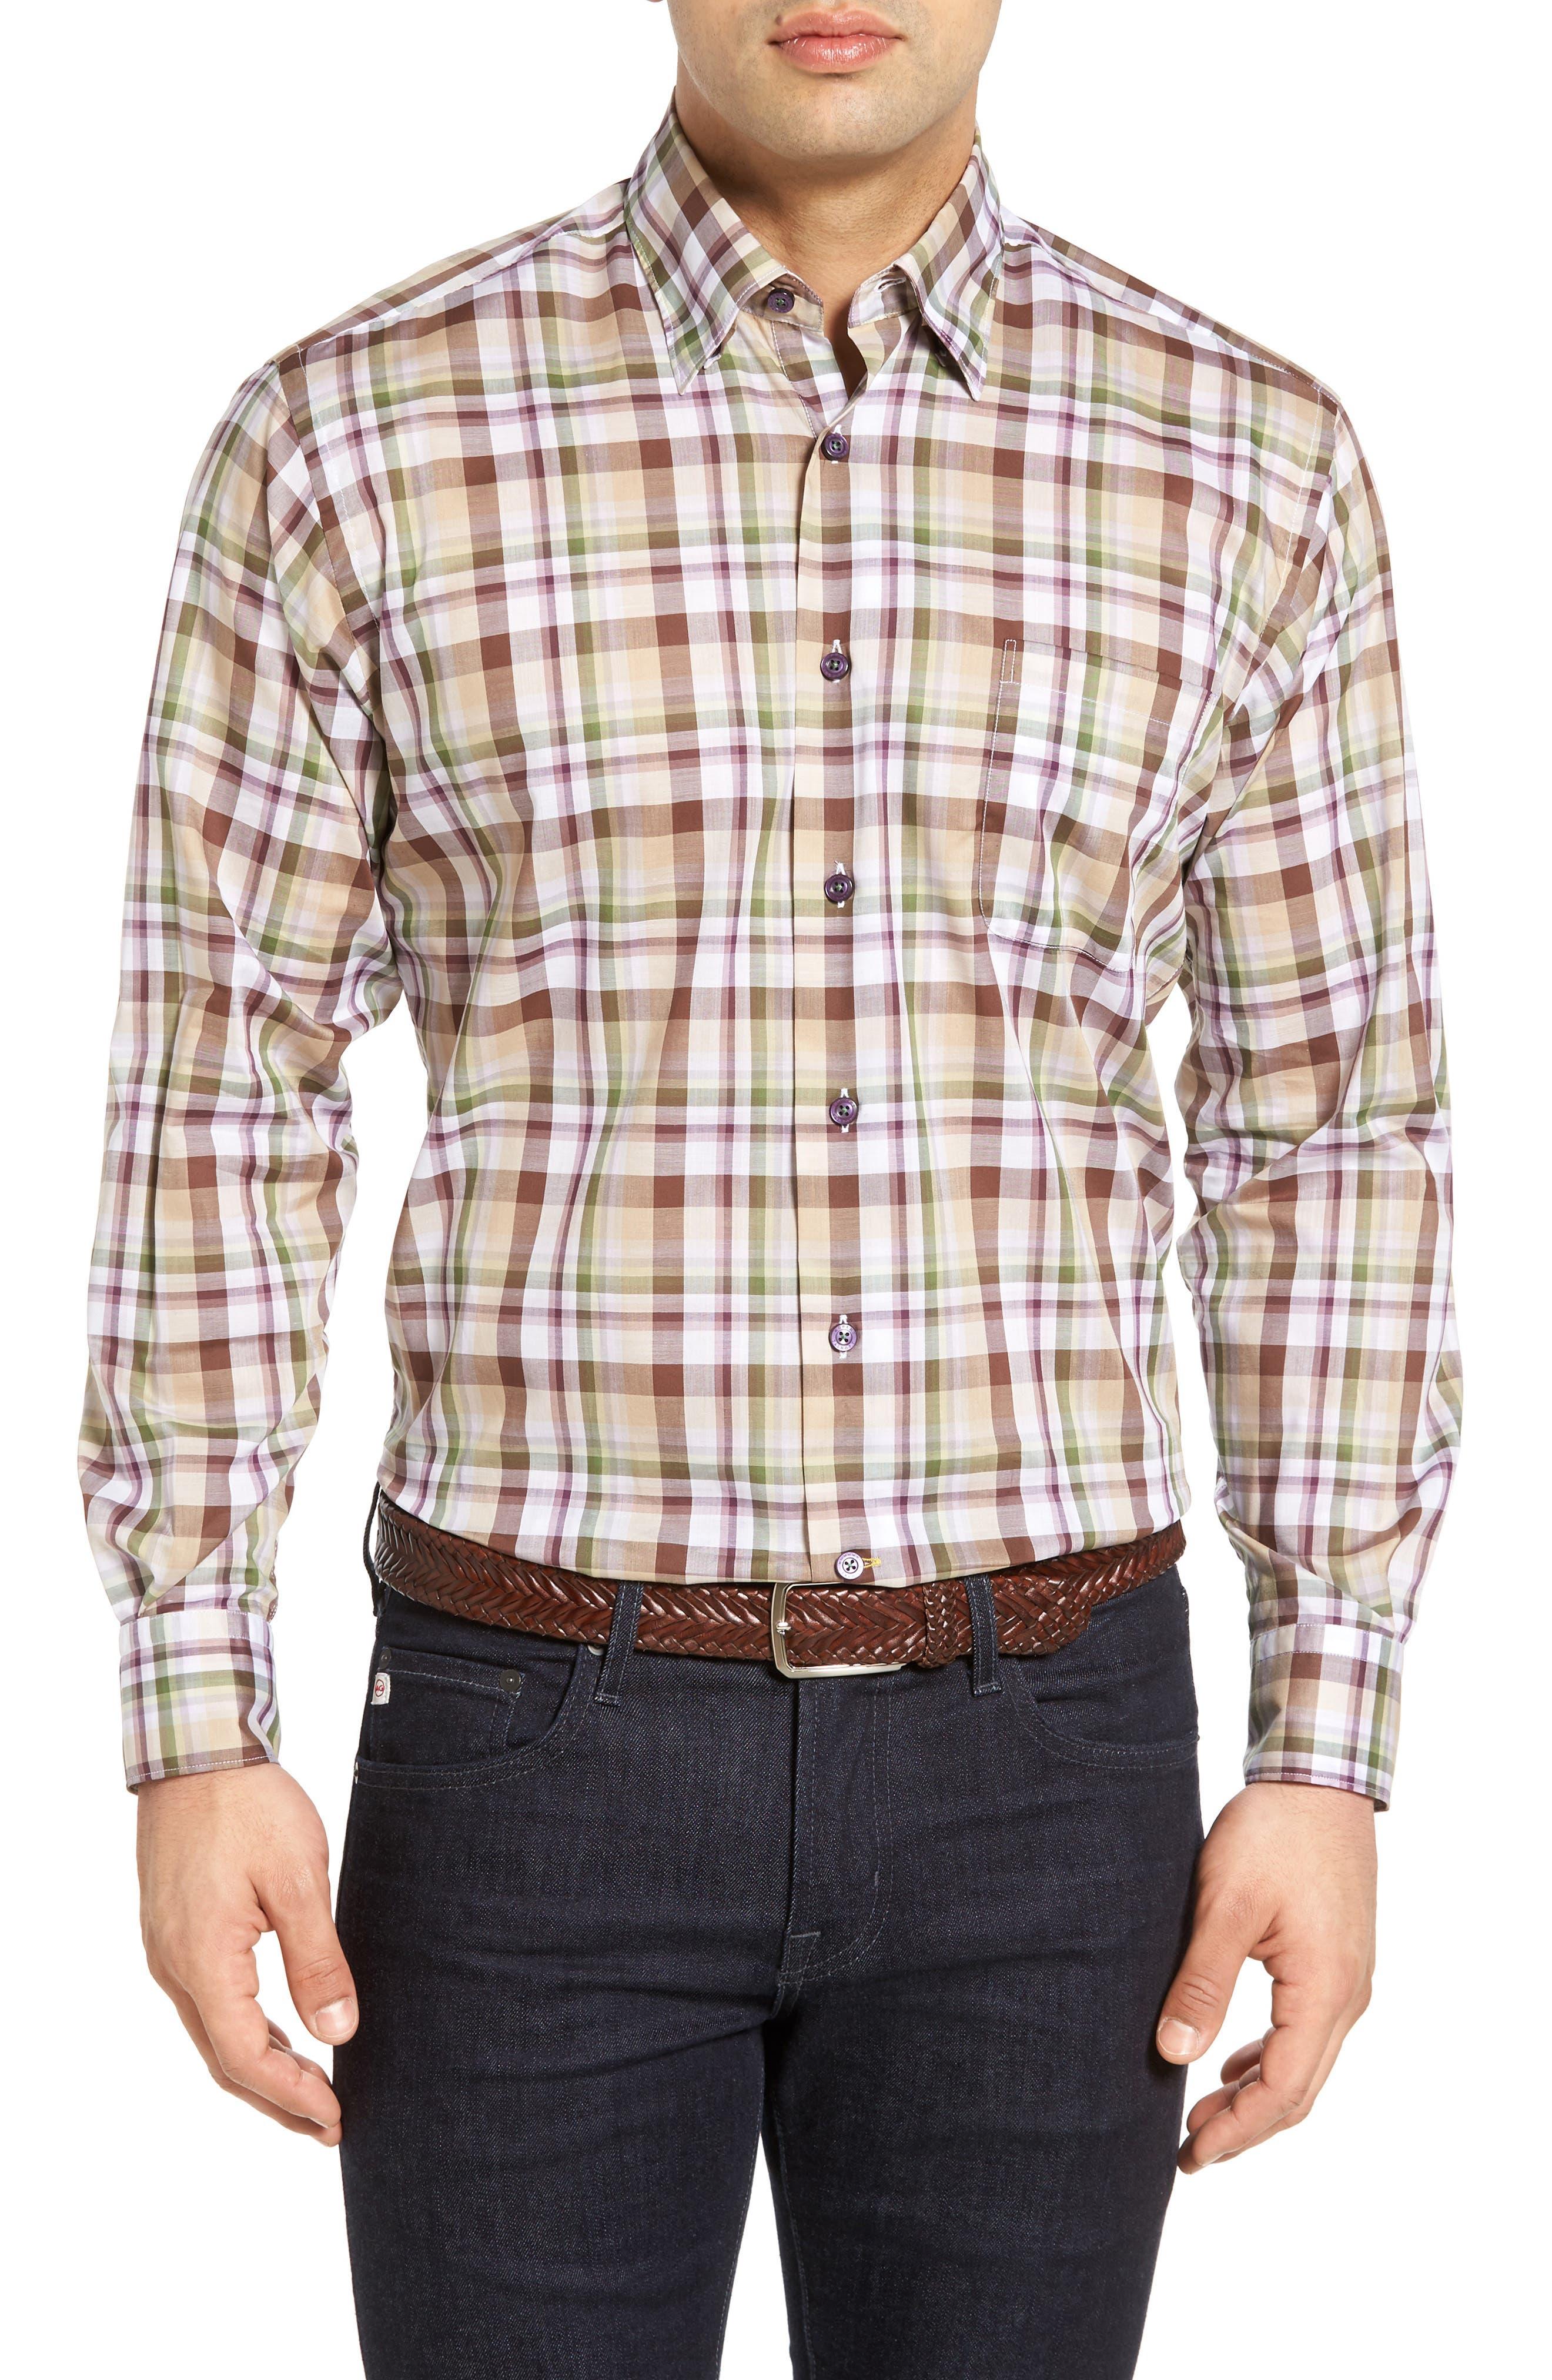 Main Image - Robert Talbott Anderson Classic Fit Sport Shirt